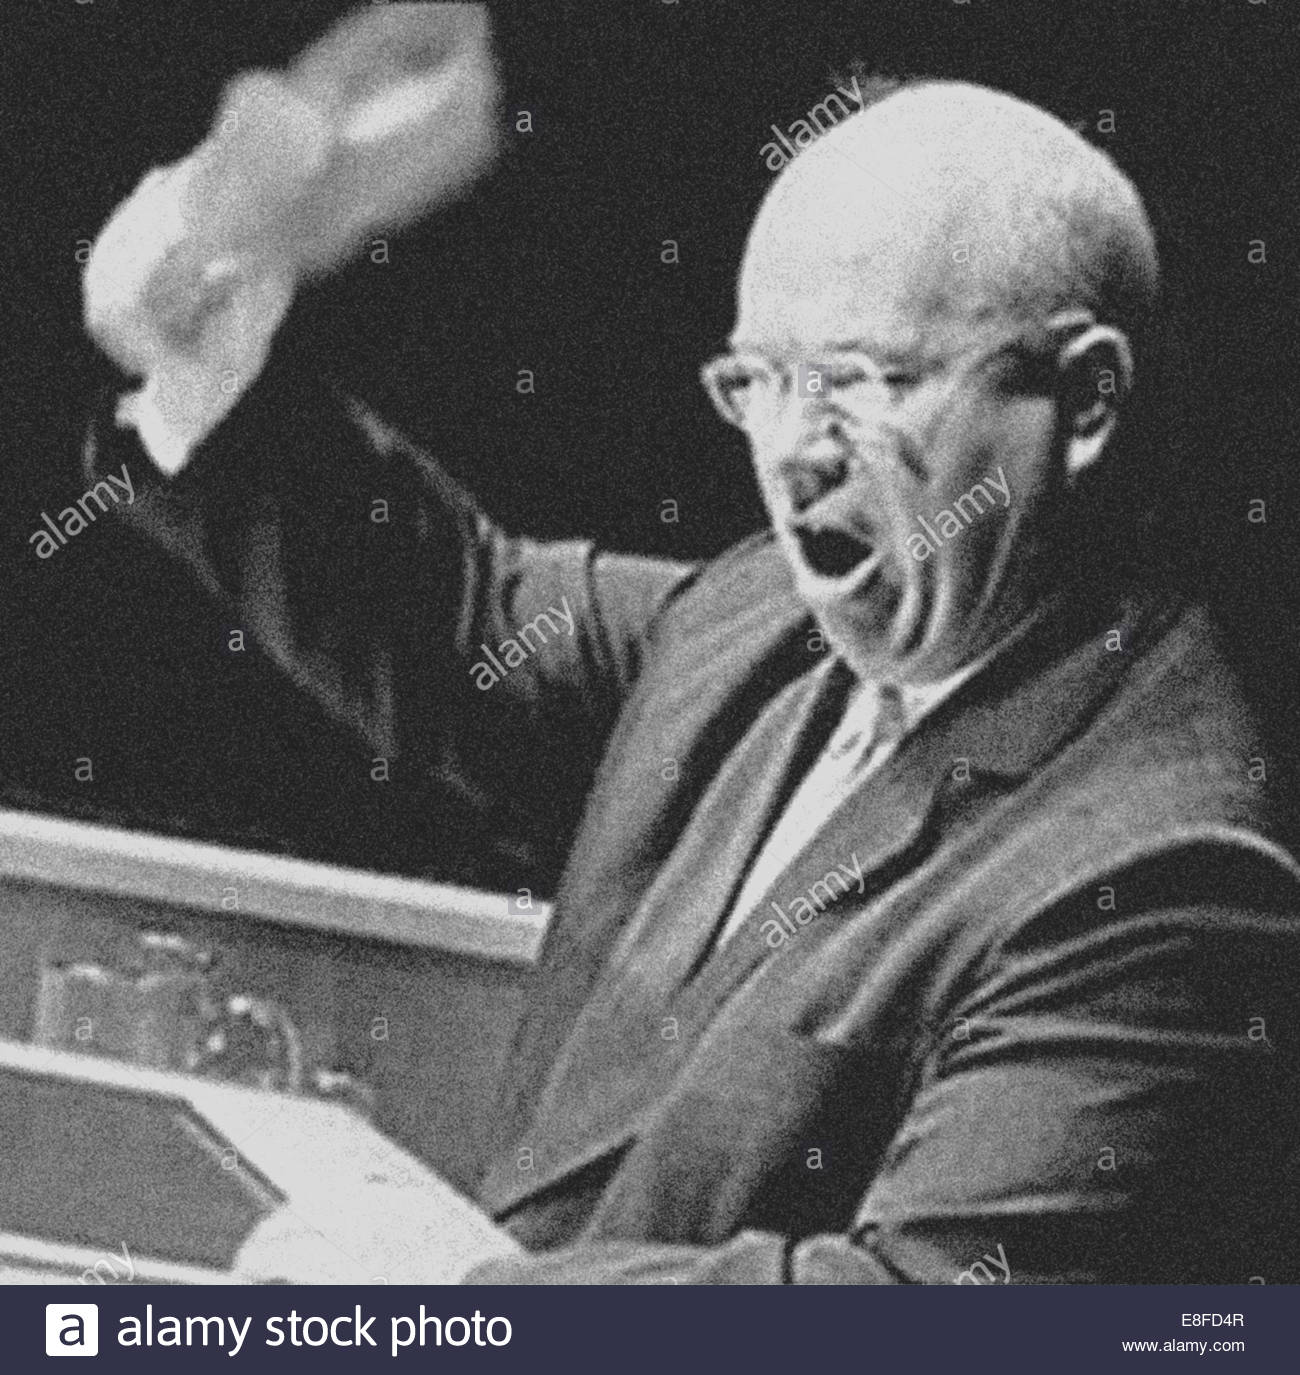 Nikita Chruschtschow auf der UN-Generalversammlung am 23. September 1960. Künstler: anonym Stockbild